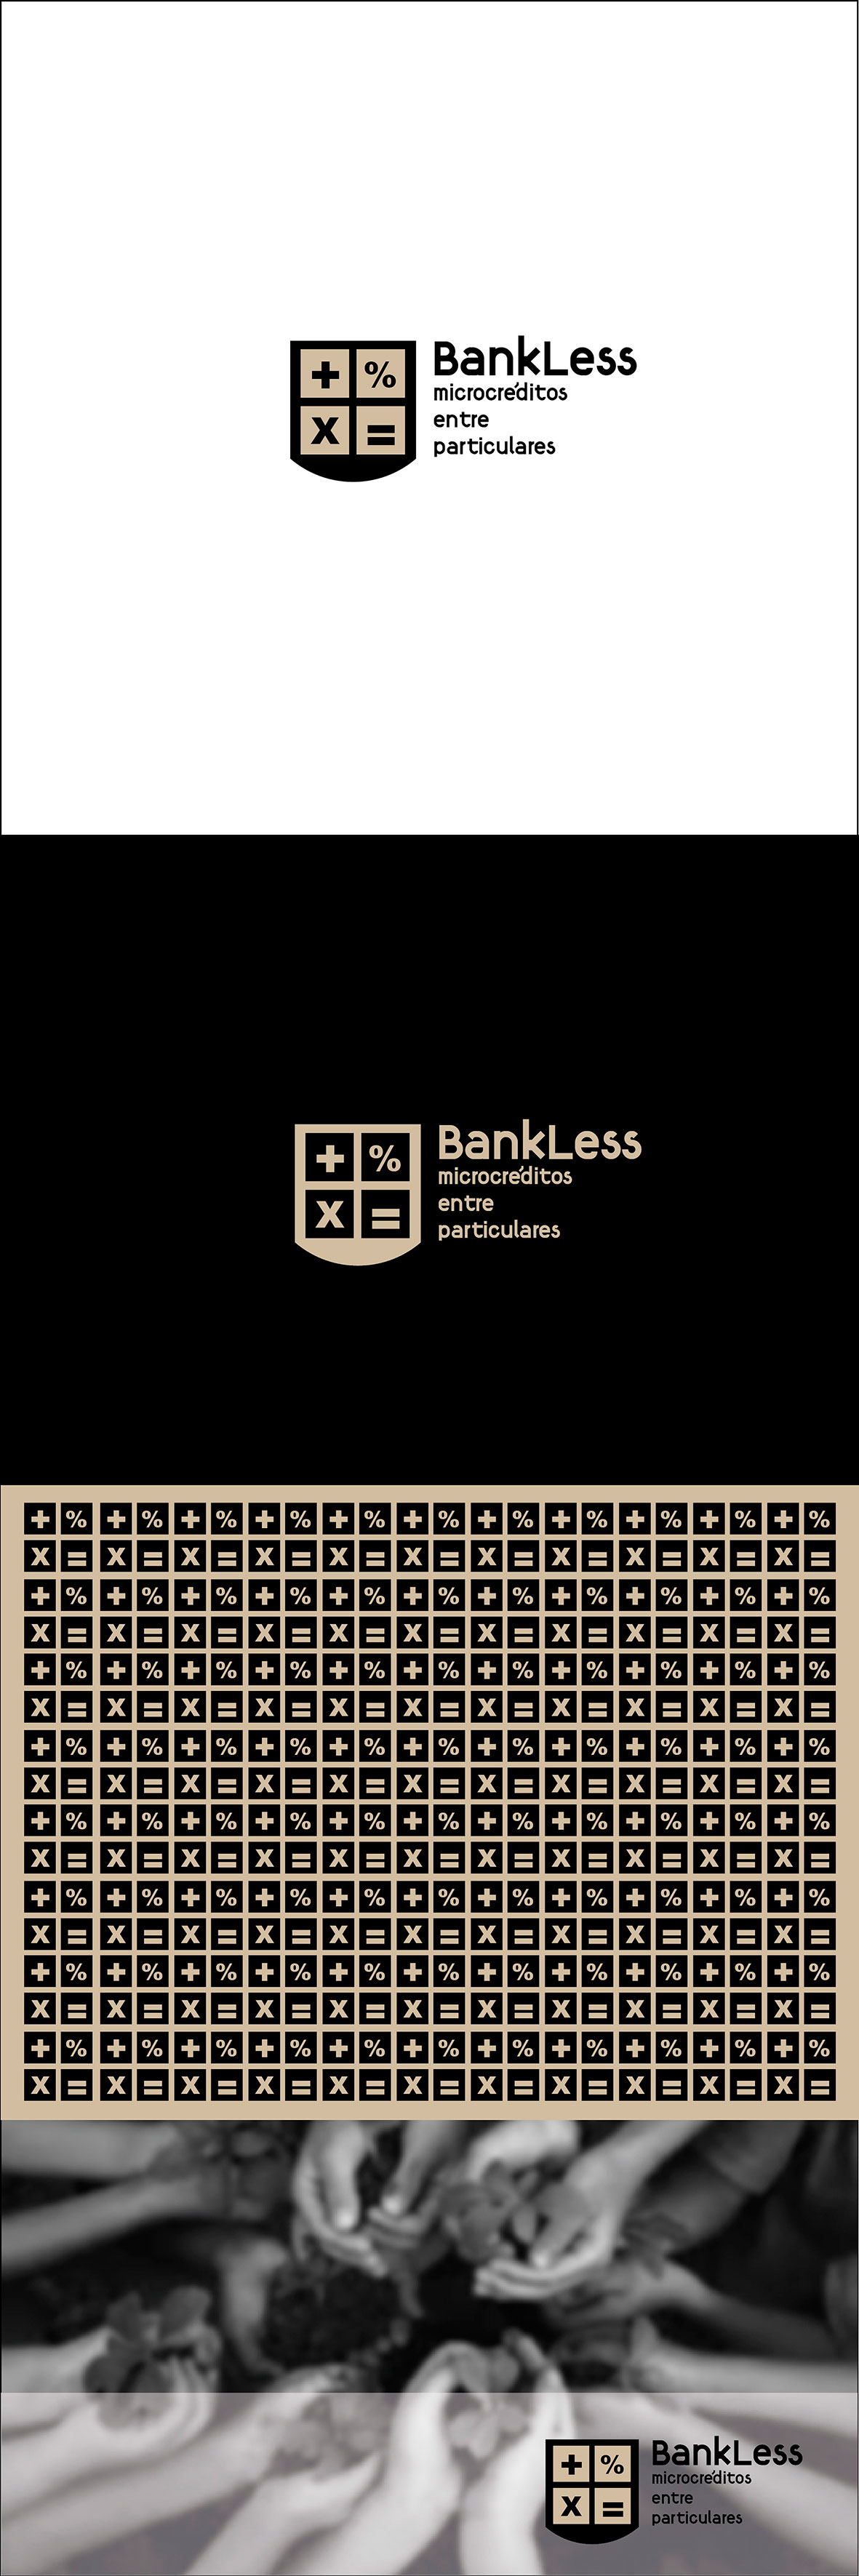 Carteleria e imagen Bankless, microcréditos entra particulares